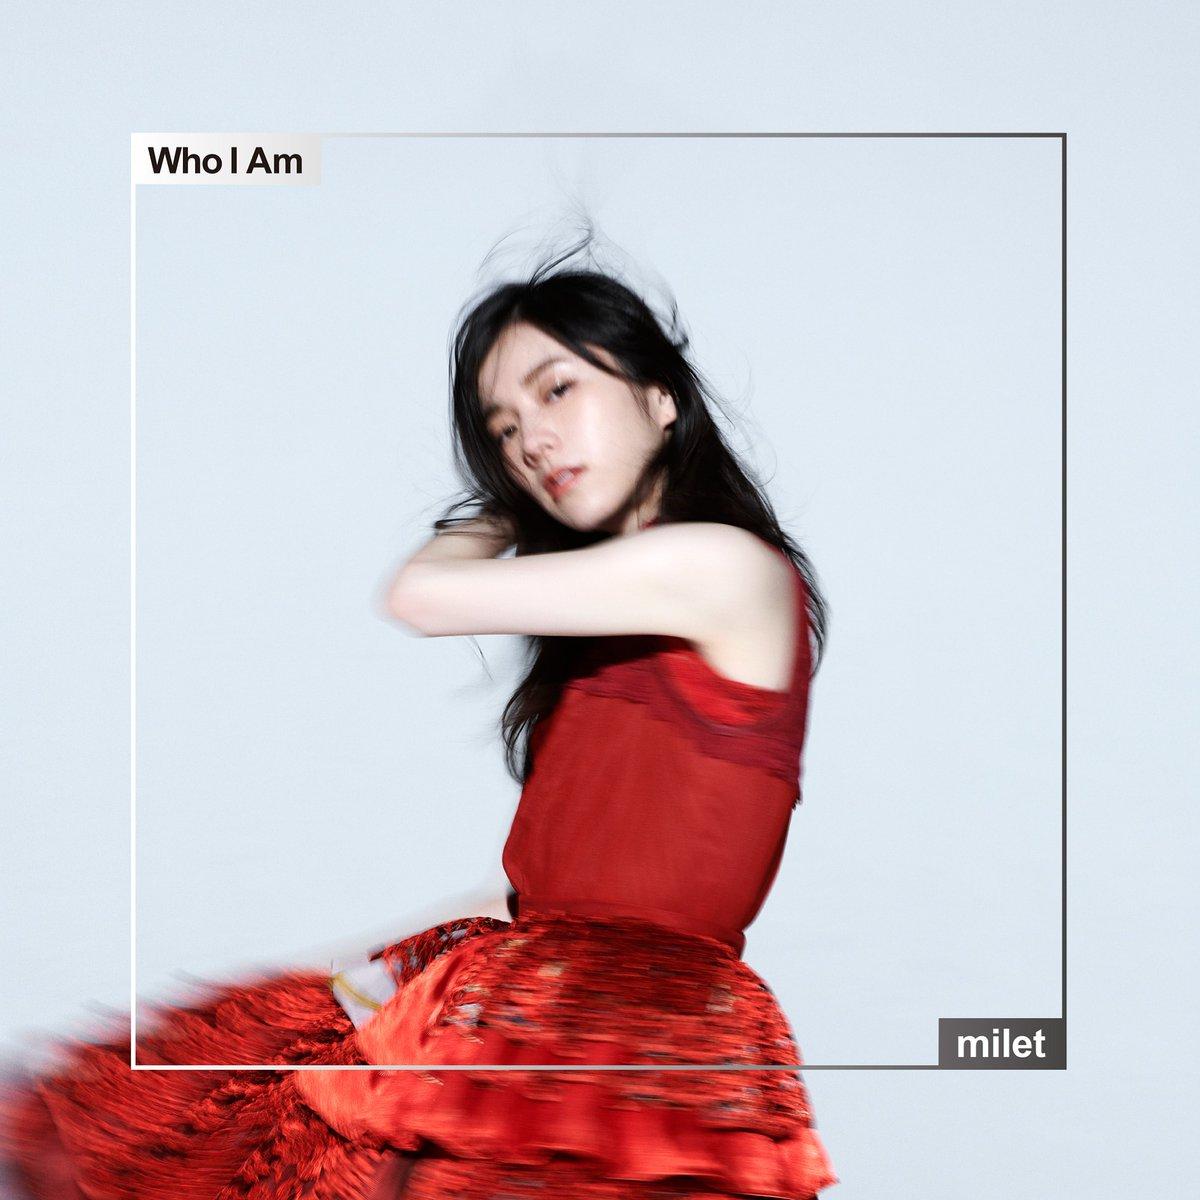 『milet - Who I Am 歌詞』収録の『Who I Am』ジャケット